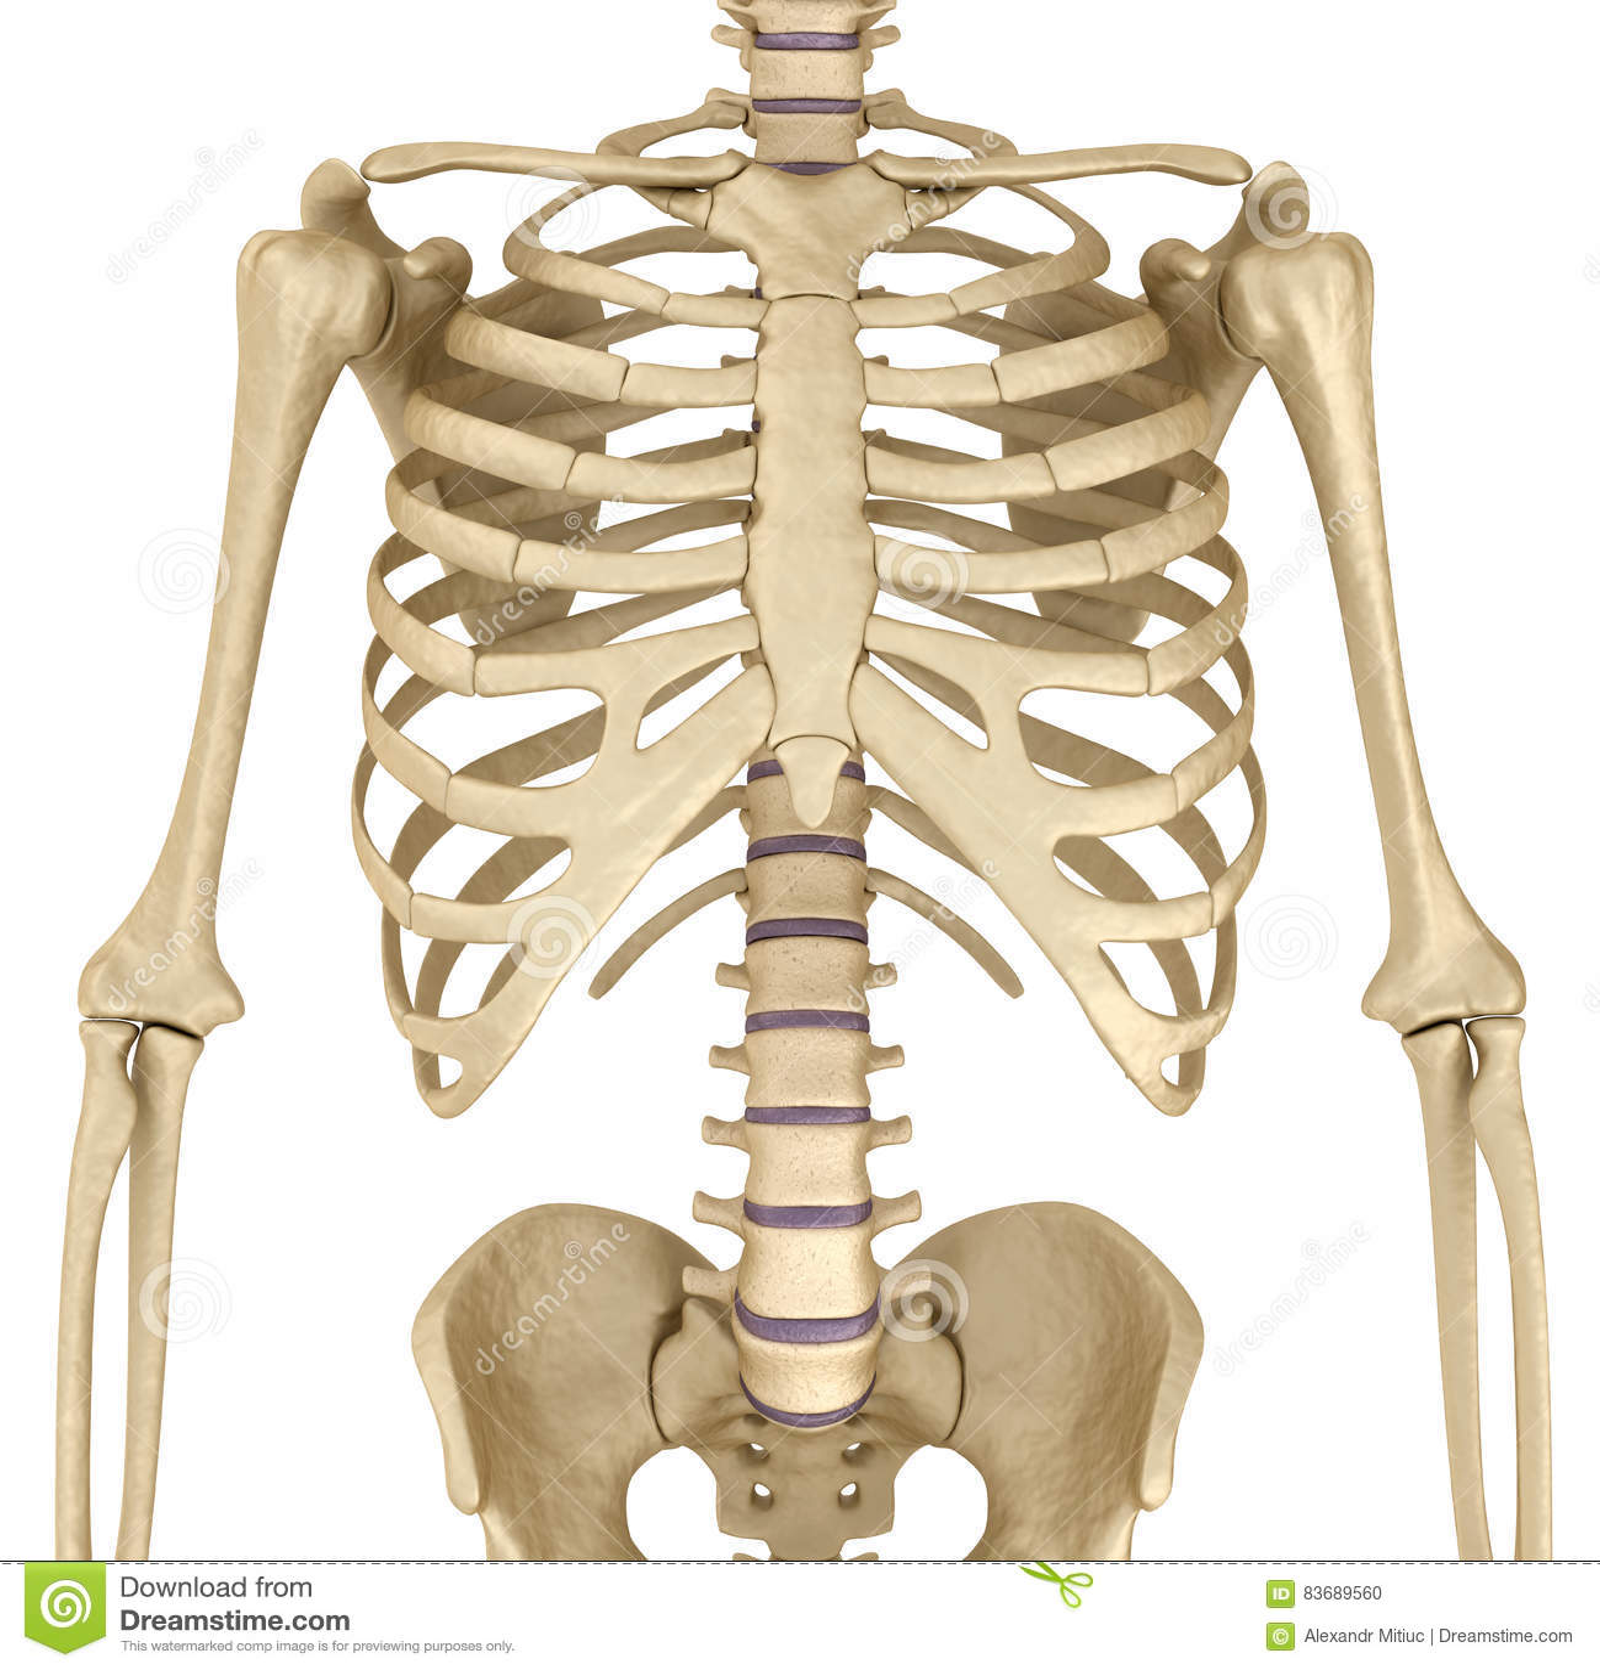 Chest anatomy bones